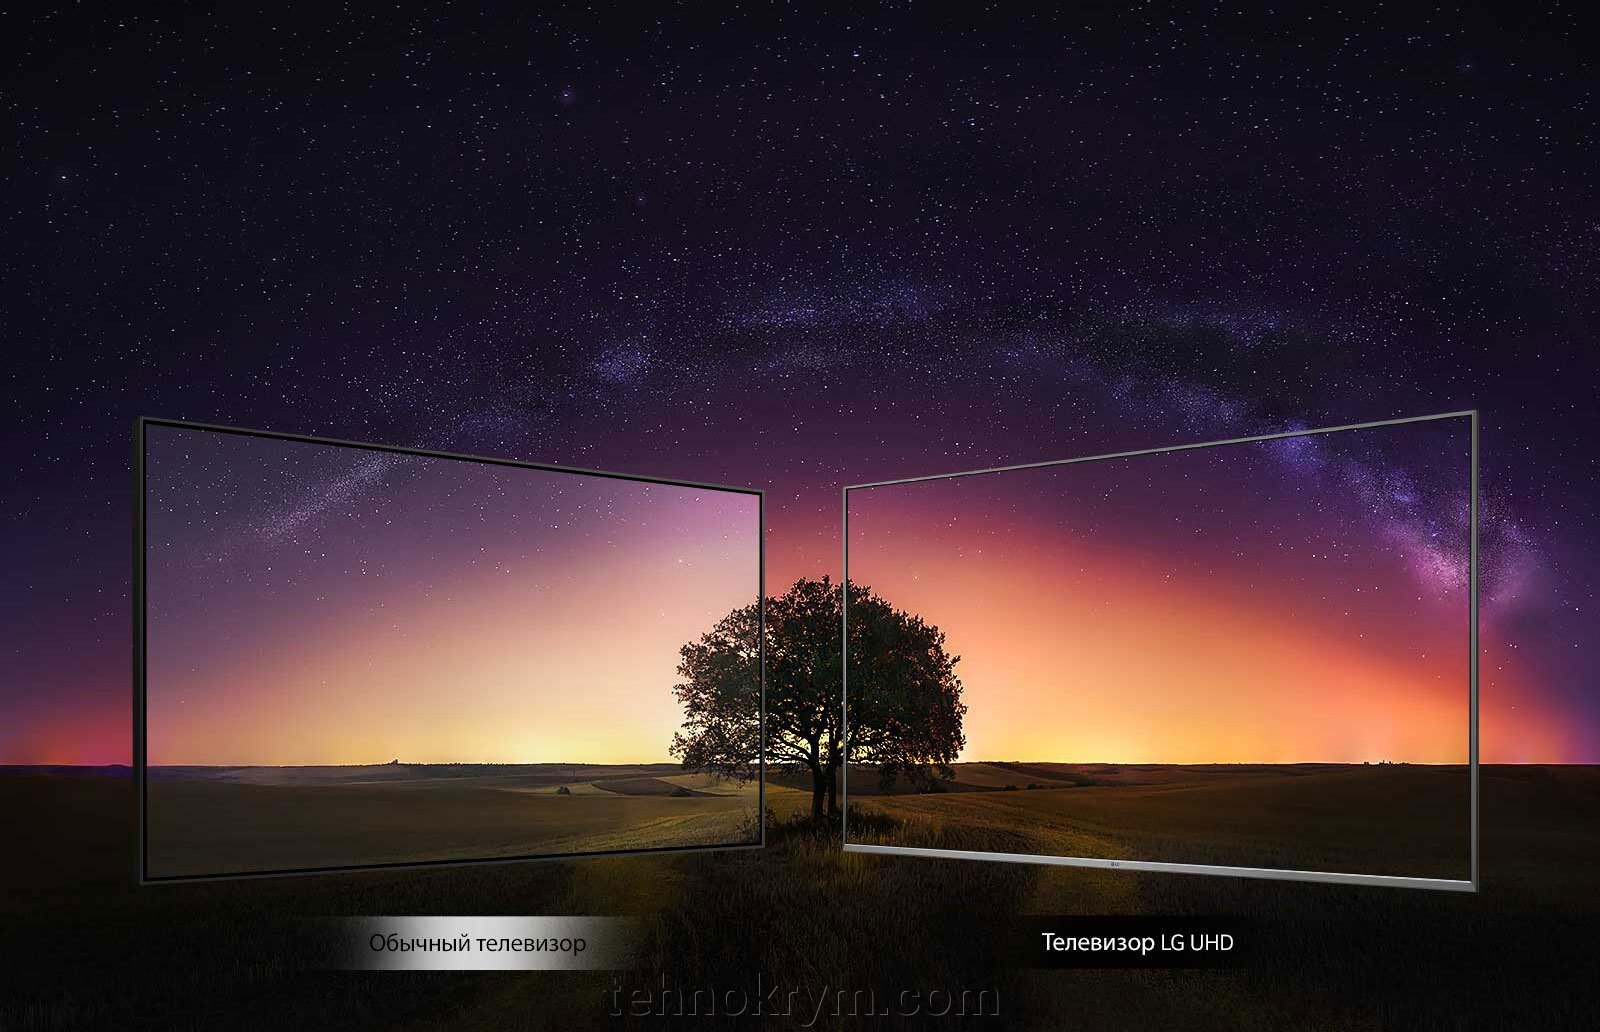 Smart Телевизор LG 55UM7450PLA, Ultra HD 4K, WebOS 4.5, новинка 2019 года - фото LG 55UM7450PLA